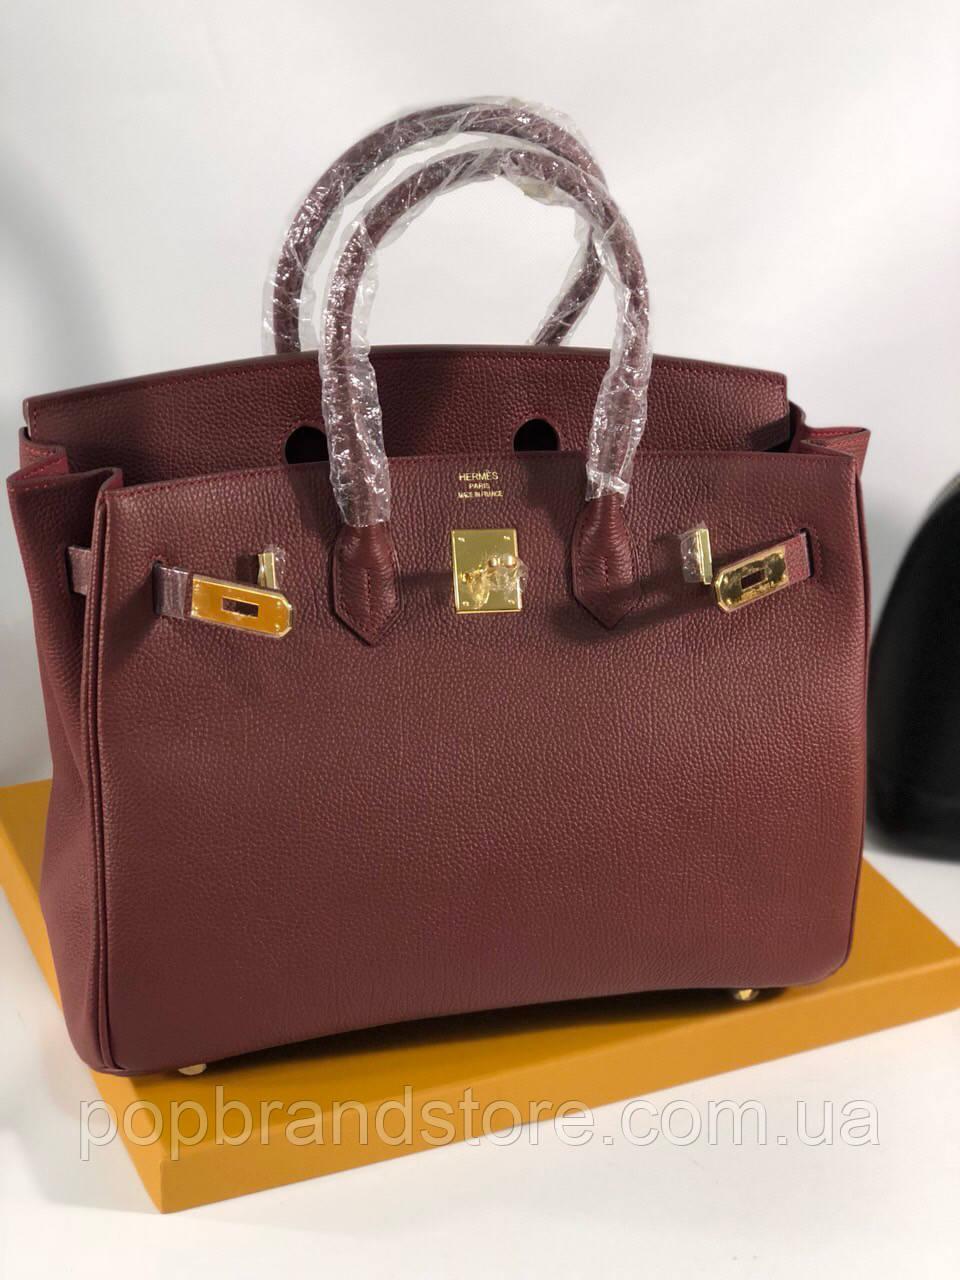 f891d12ef9ac Елегантная женская сумка Гермес Биркин 35 см бордо (реплика) - Pop Brand  Store